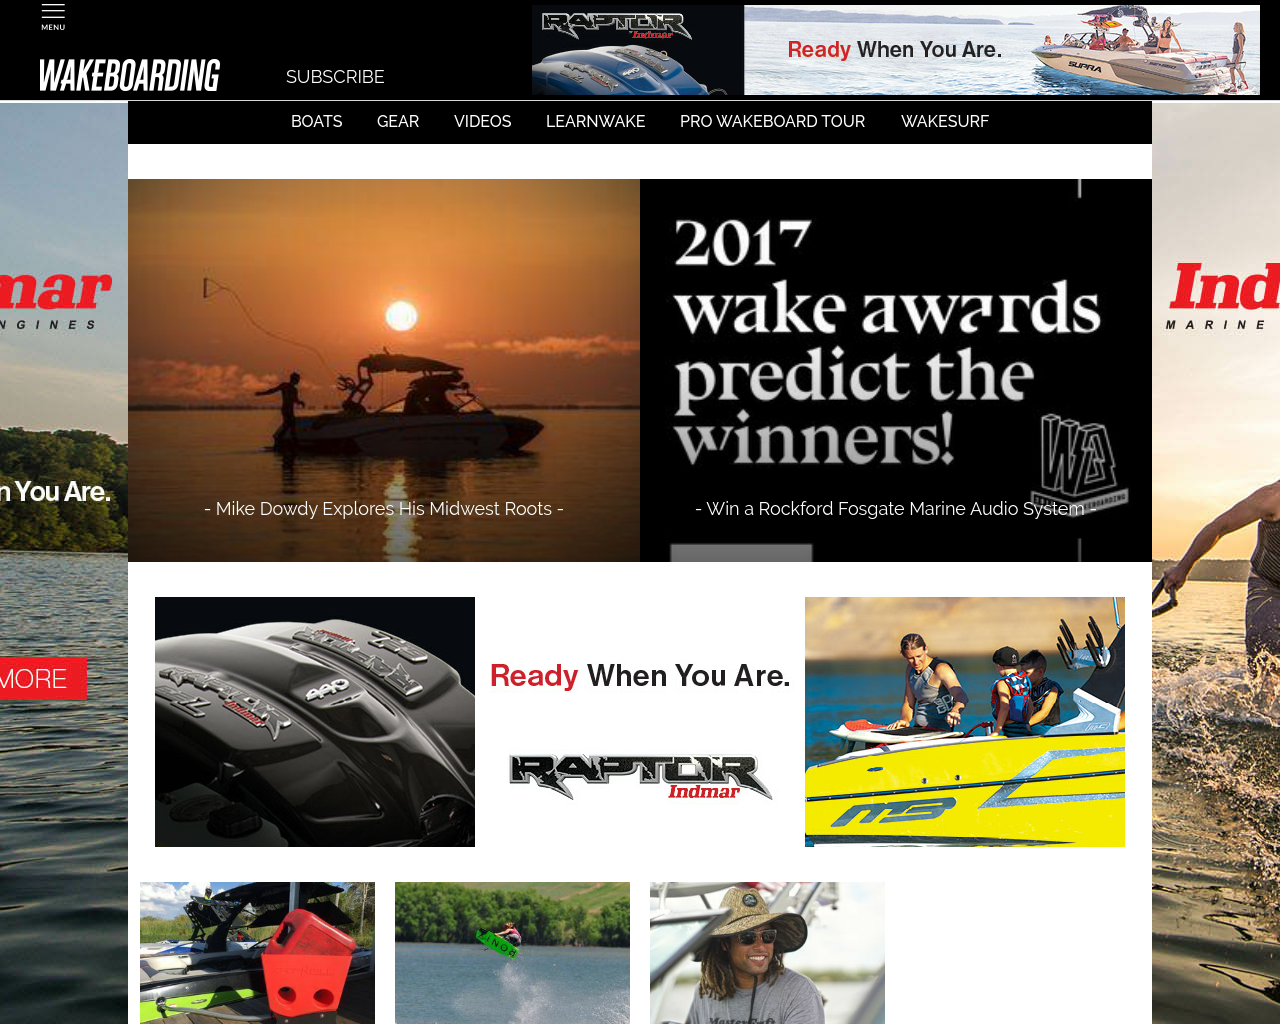 Wakeboarding-Advertising-Reviews-Pricing